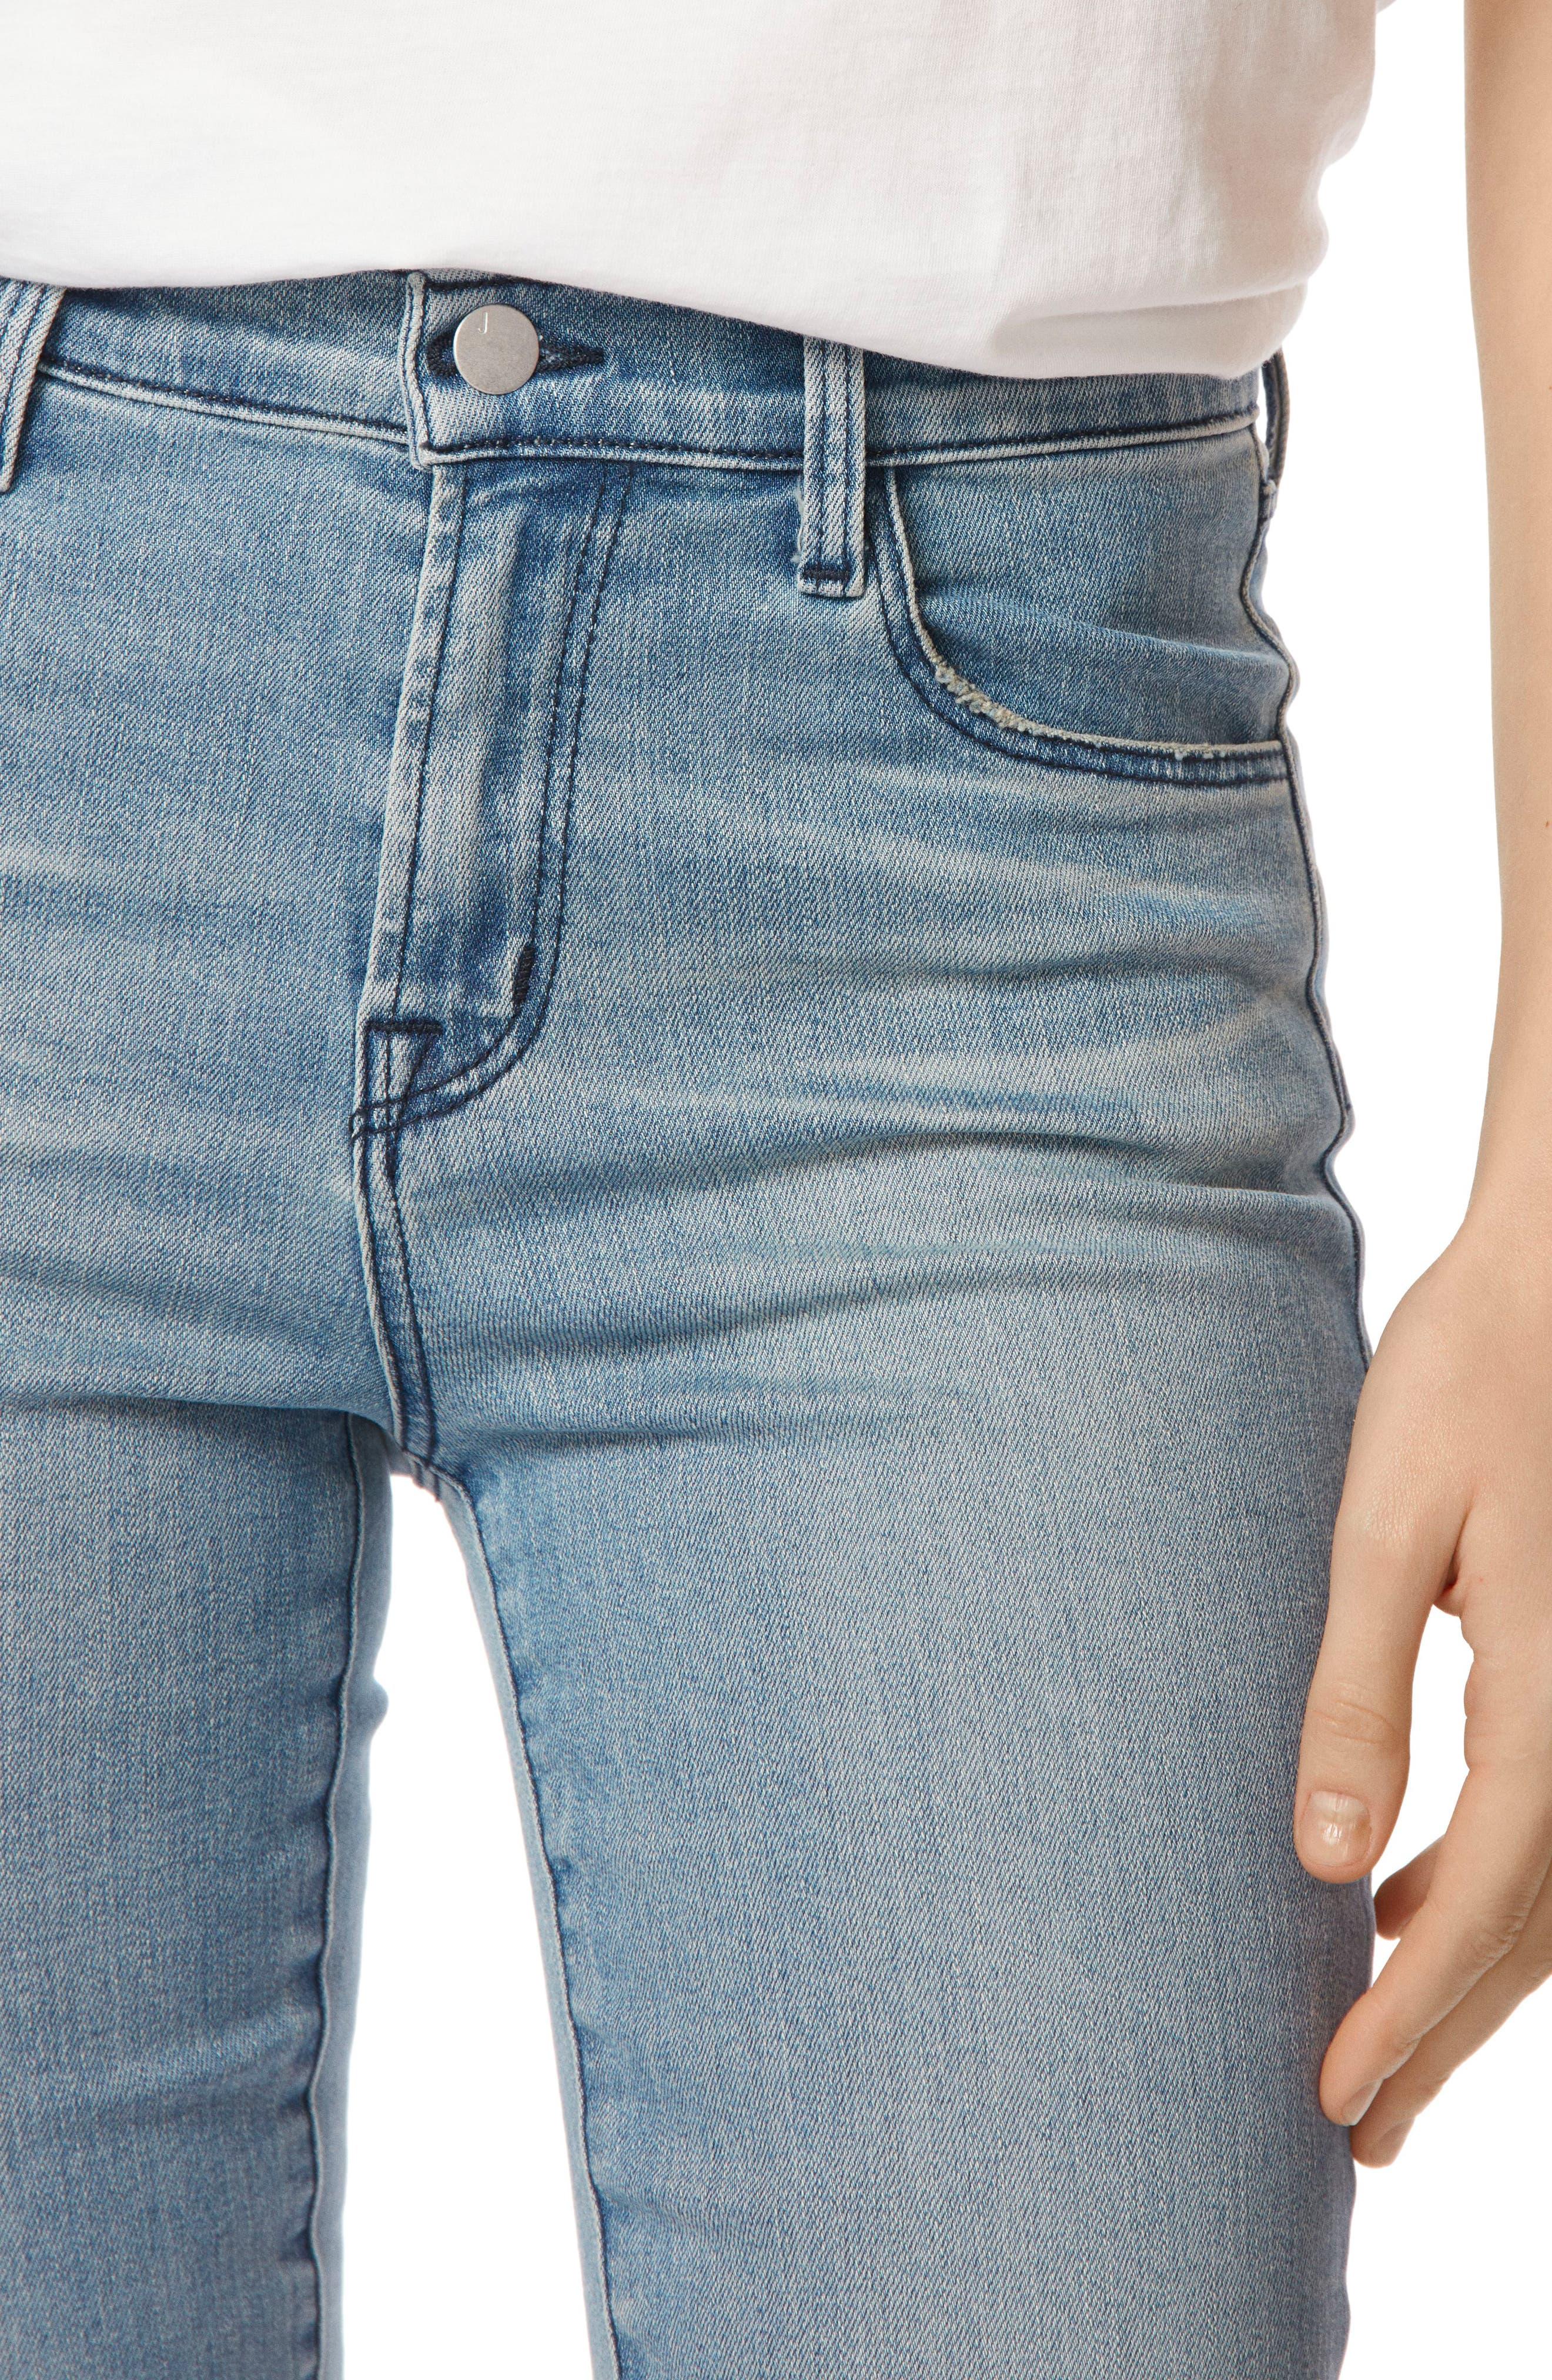 J BRAND, Maria High Waist Skinny Jeans, Alternate thumbnail 5, color, 407